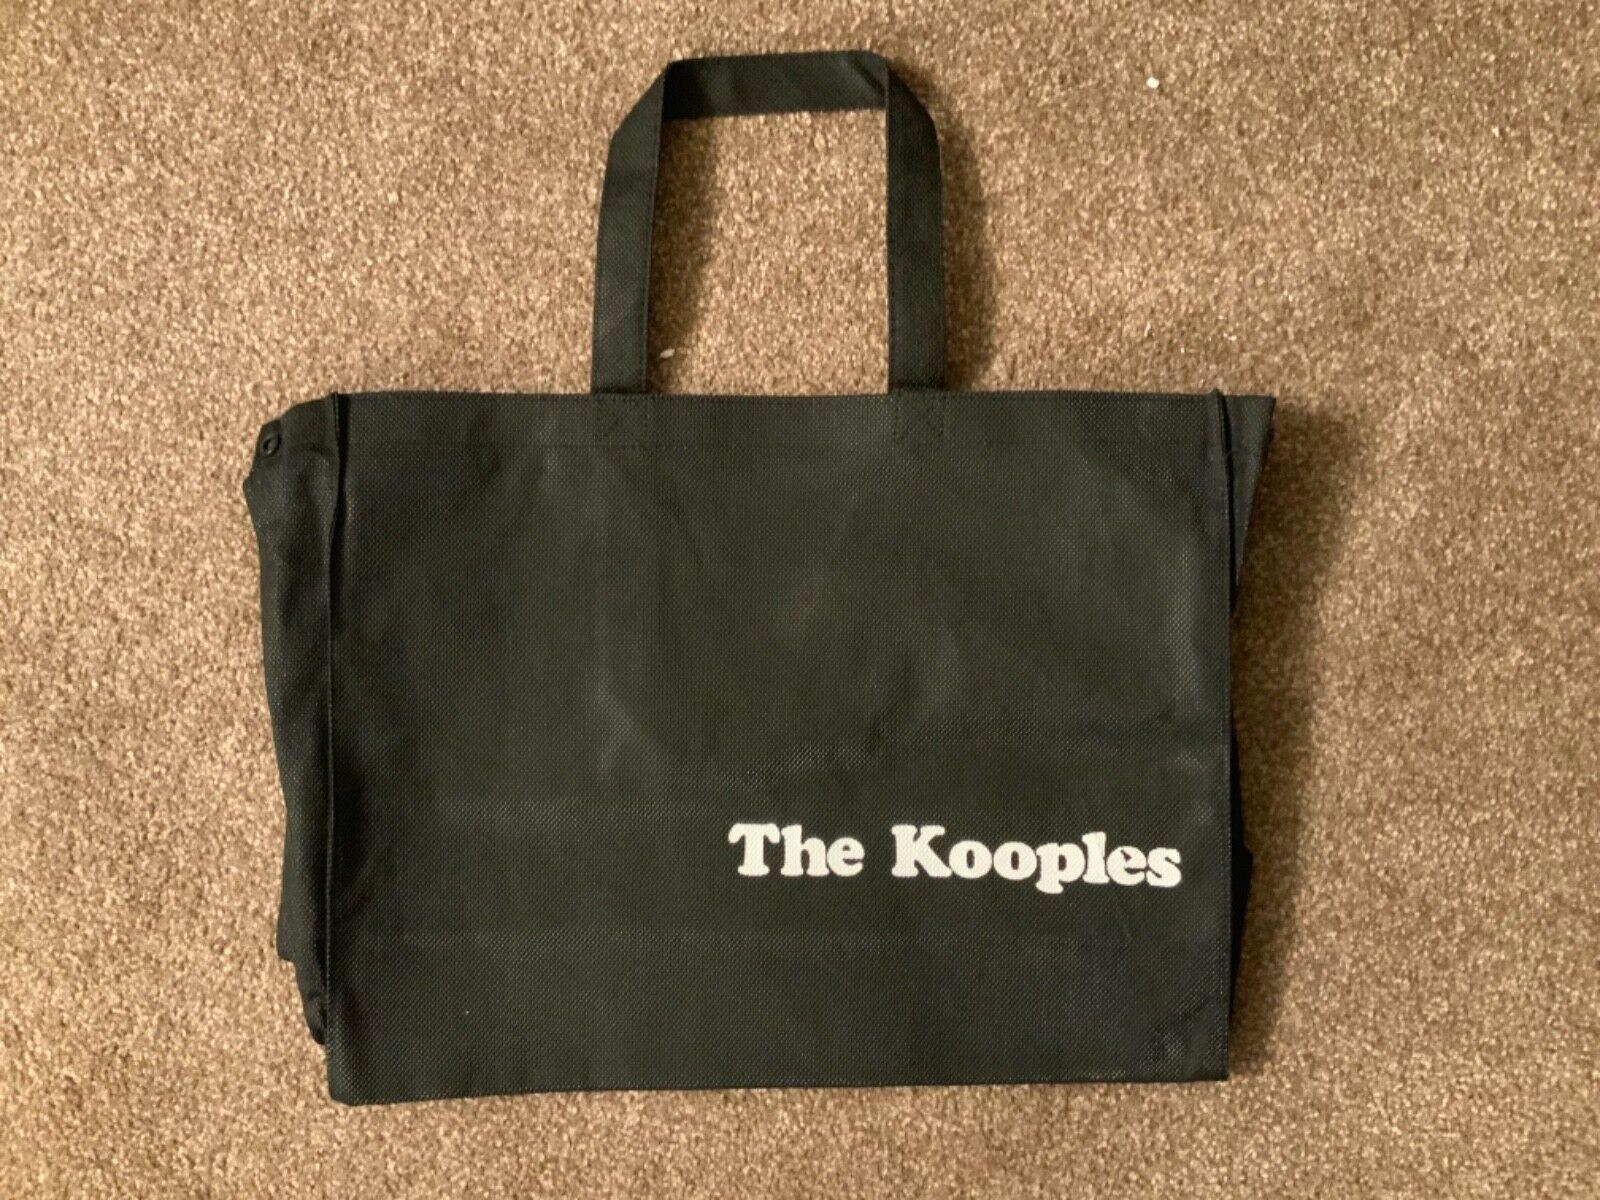 THE KOOPLES MEDIUM SIZE TOTE BAG SHOPPING BAG CANVAS BAG